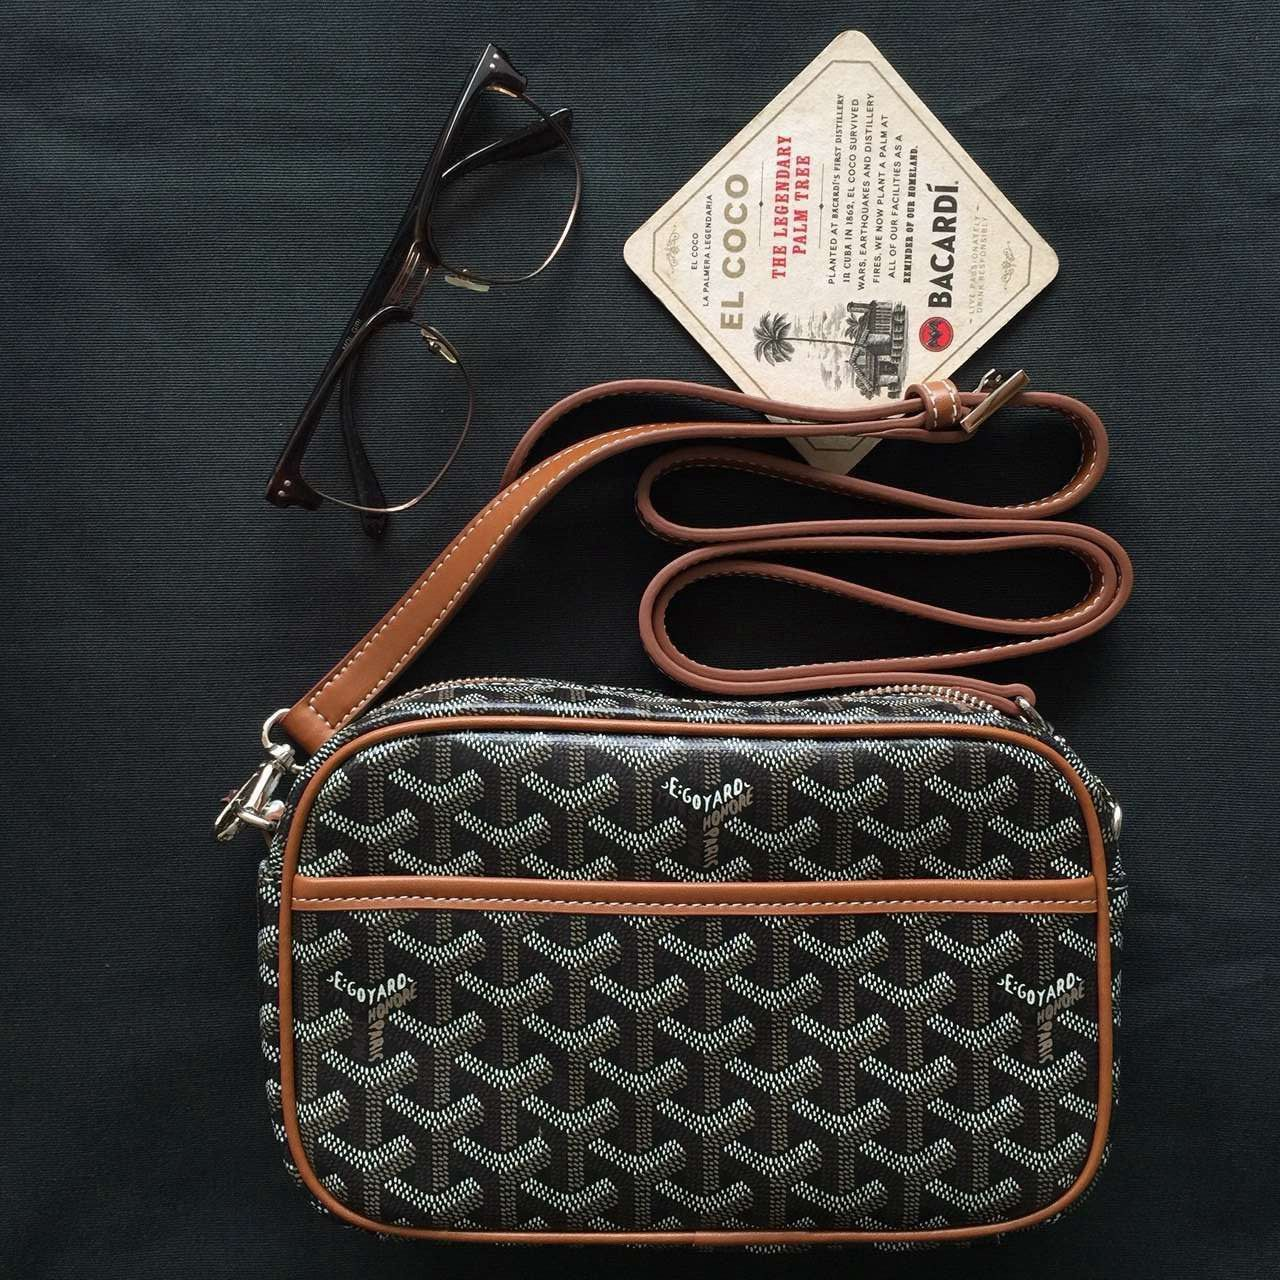 Goyard Camera Case Bag 68 Email Winnie Shoescrazy Net Goyard Cap Vert Bag Man Bag Bag Obsession